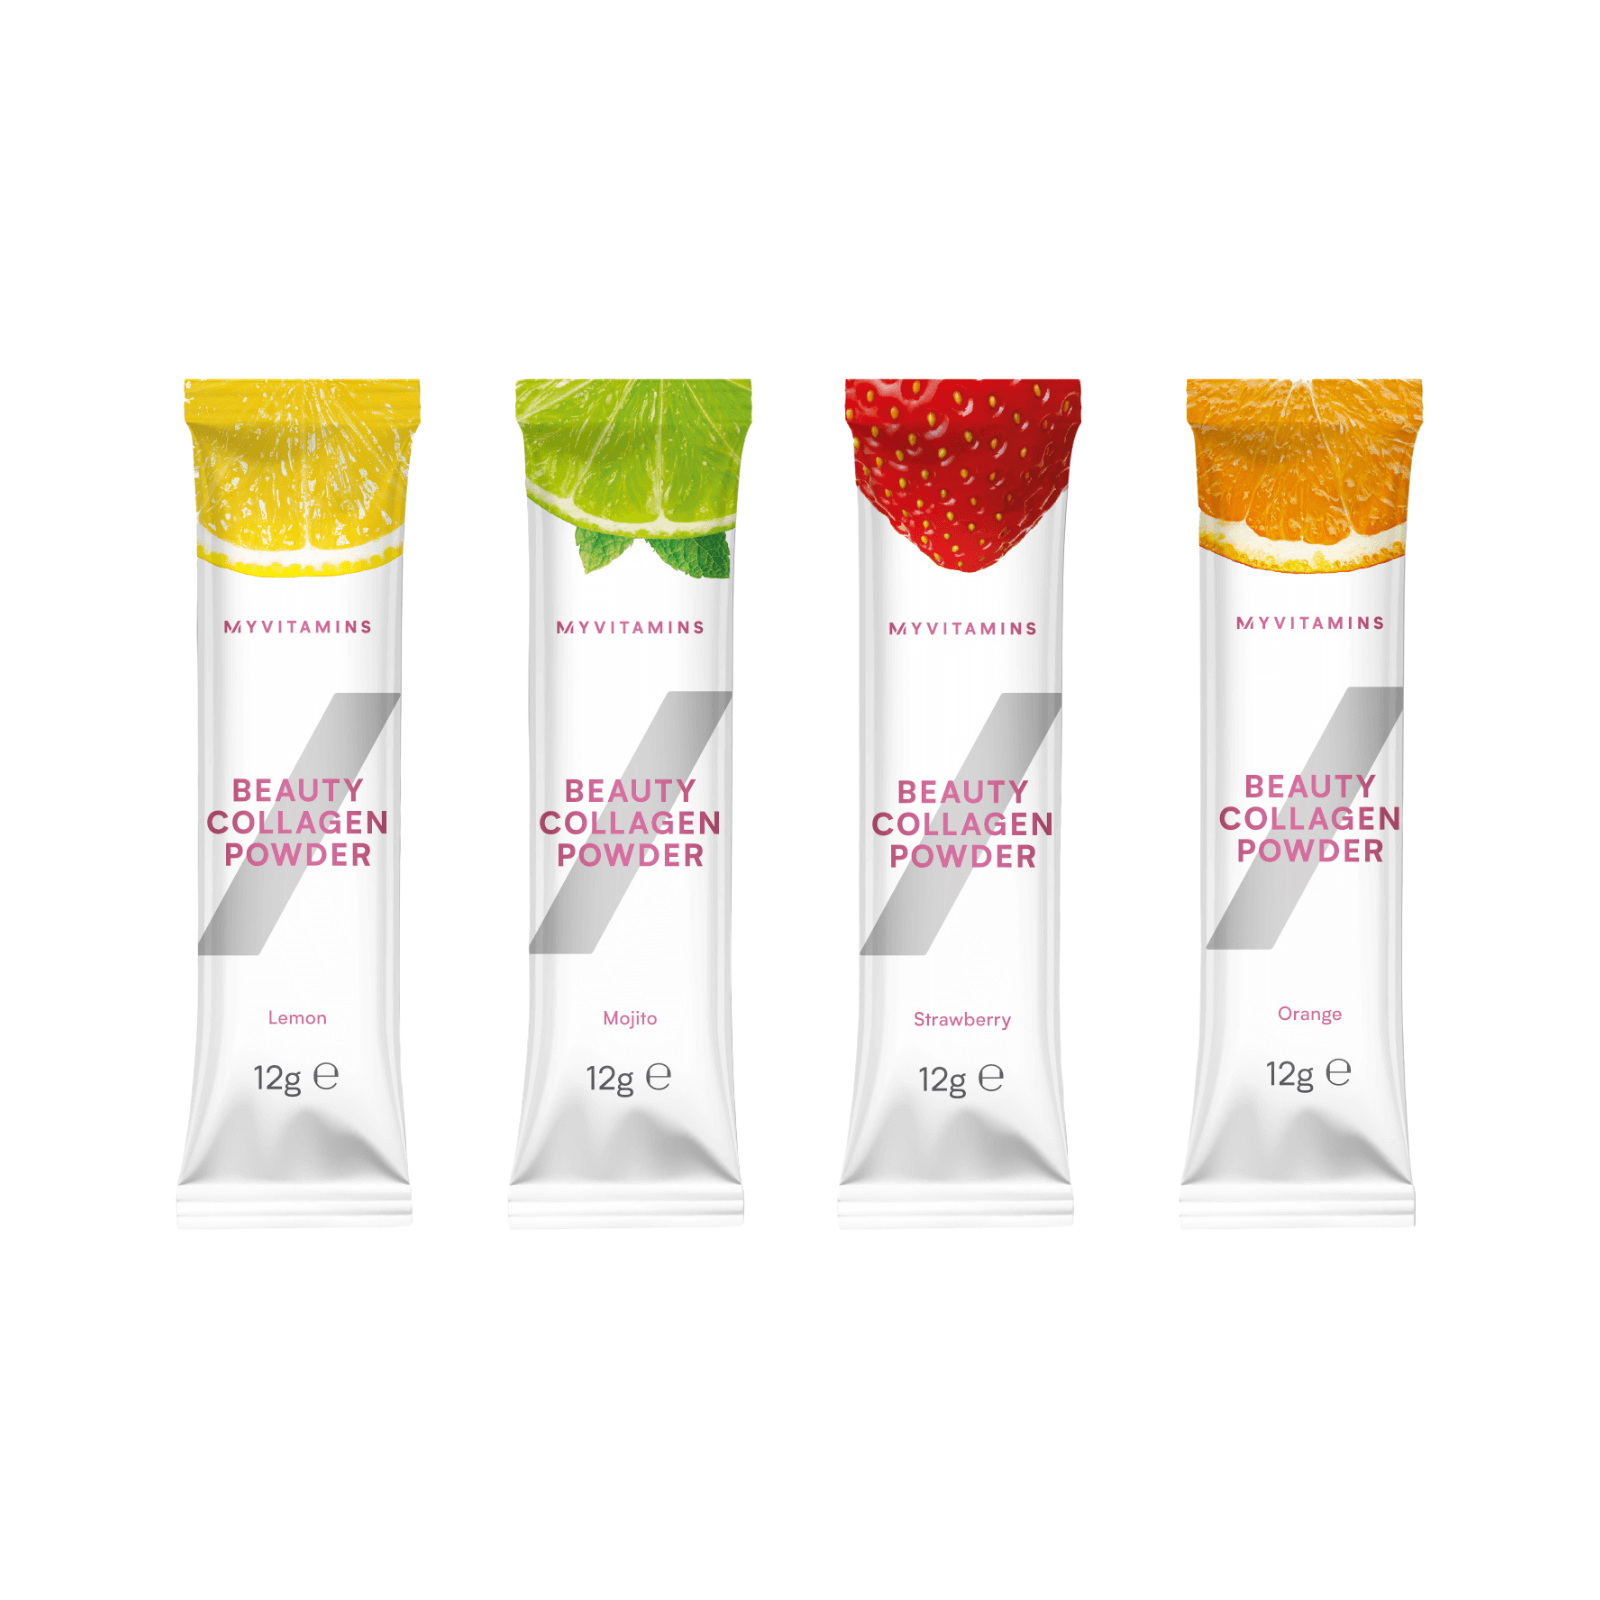 Beauty Collagen Powder Stick Pack (Sample) - 12g - Strawberry